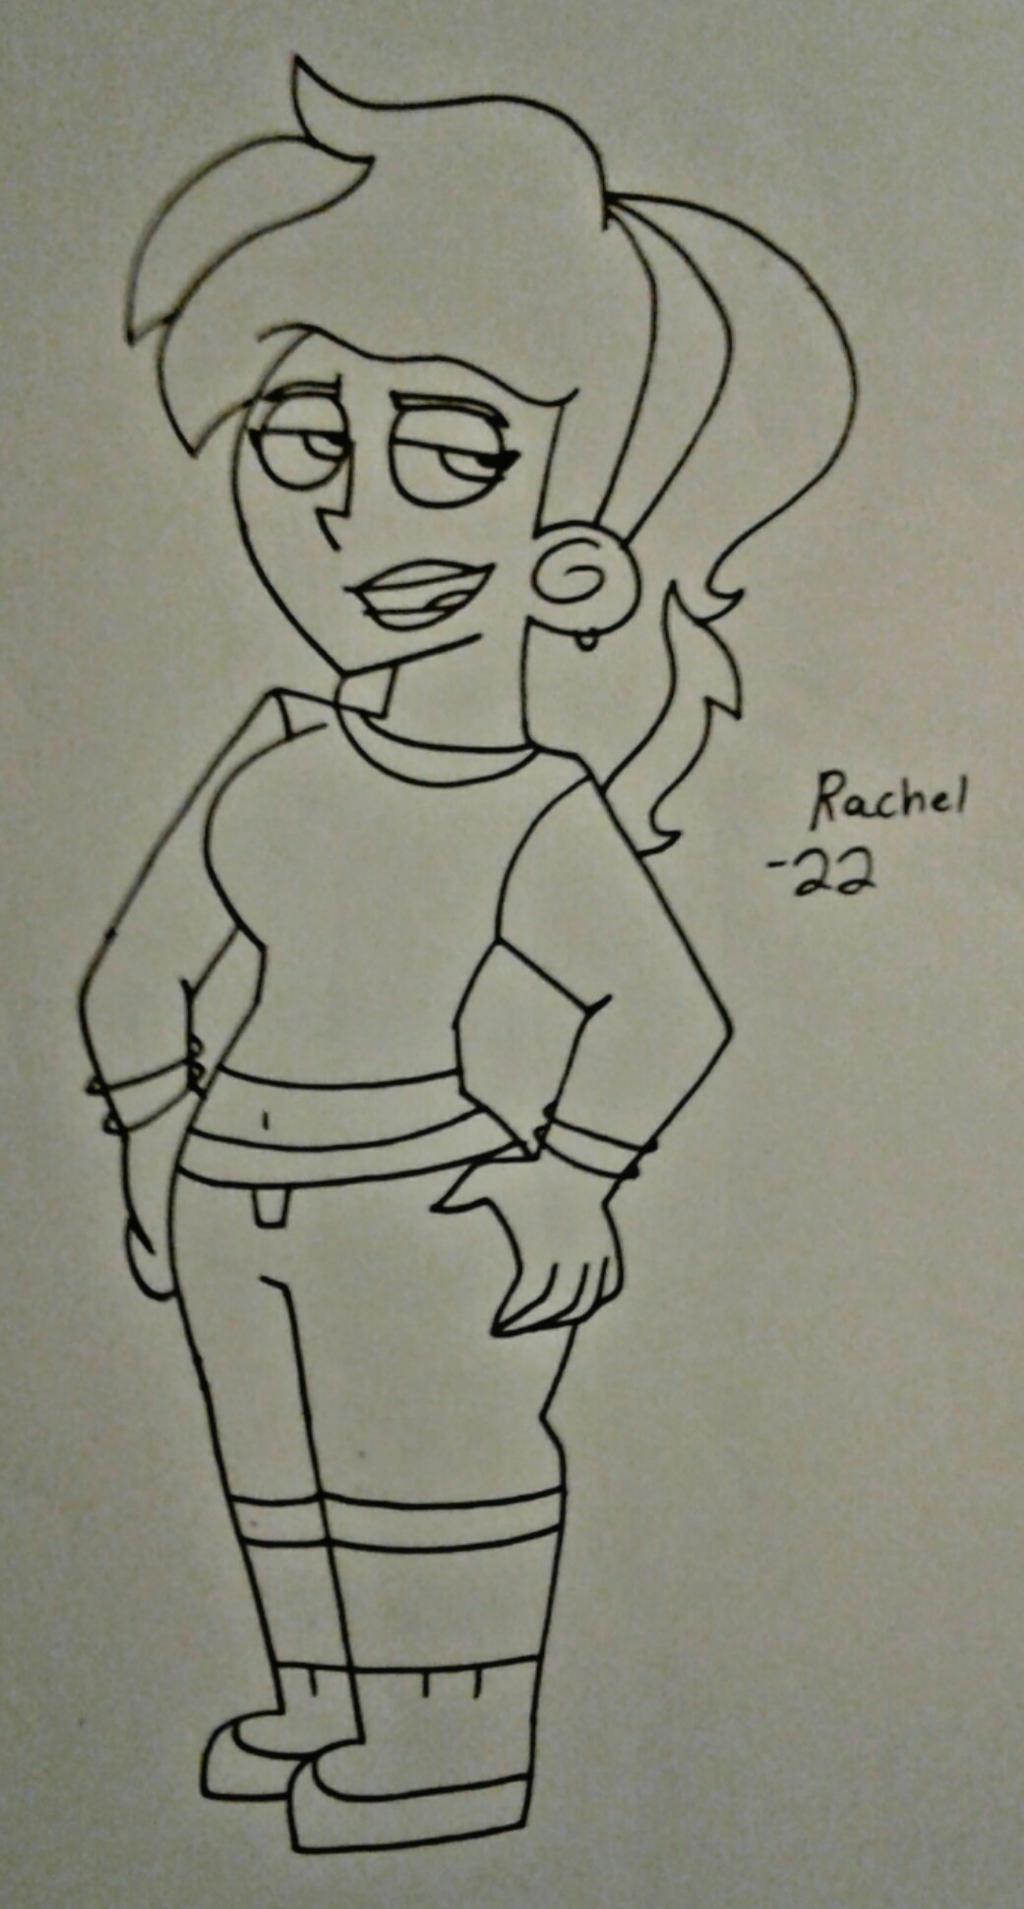 Rachel by Ashartz123